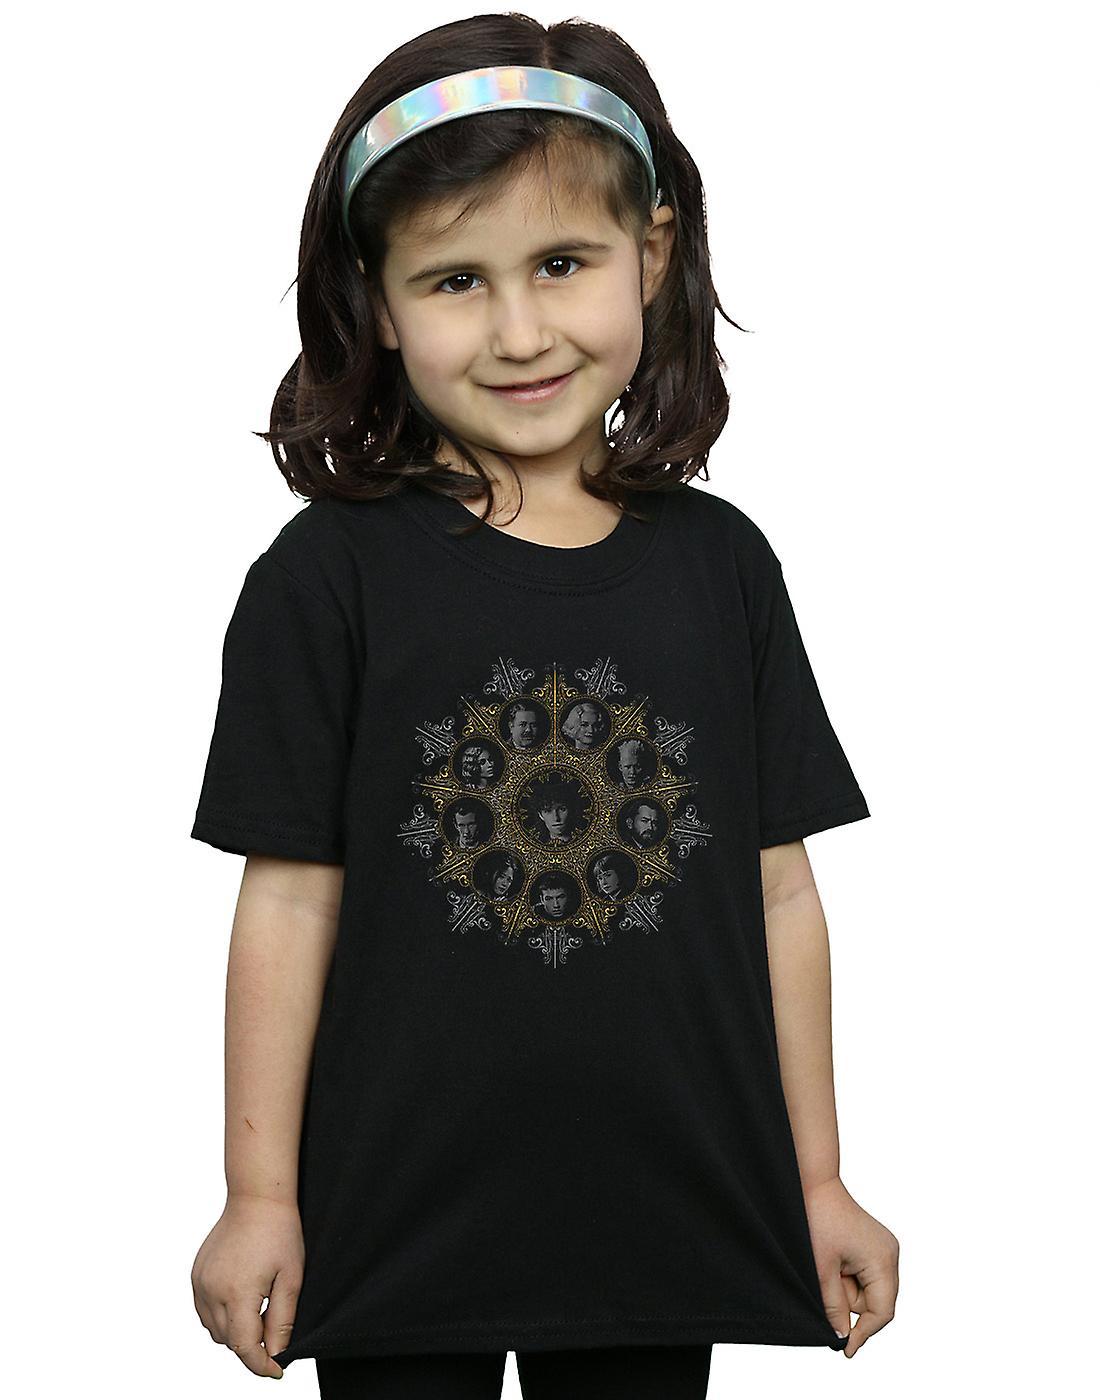 Fantastic Beasts Girls Character Crest T-Shirt